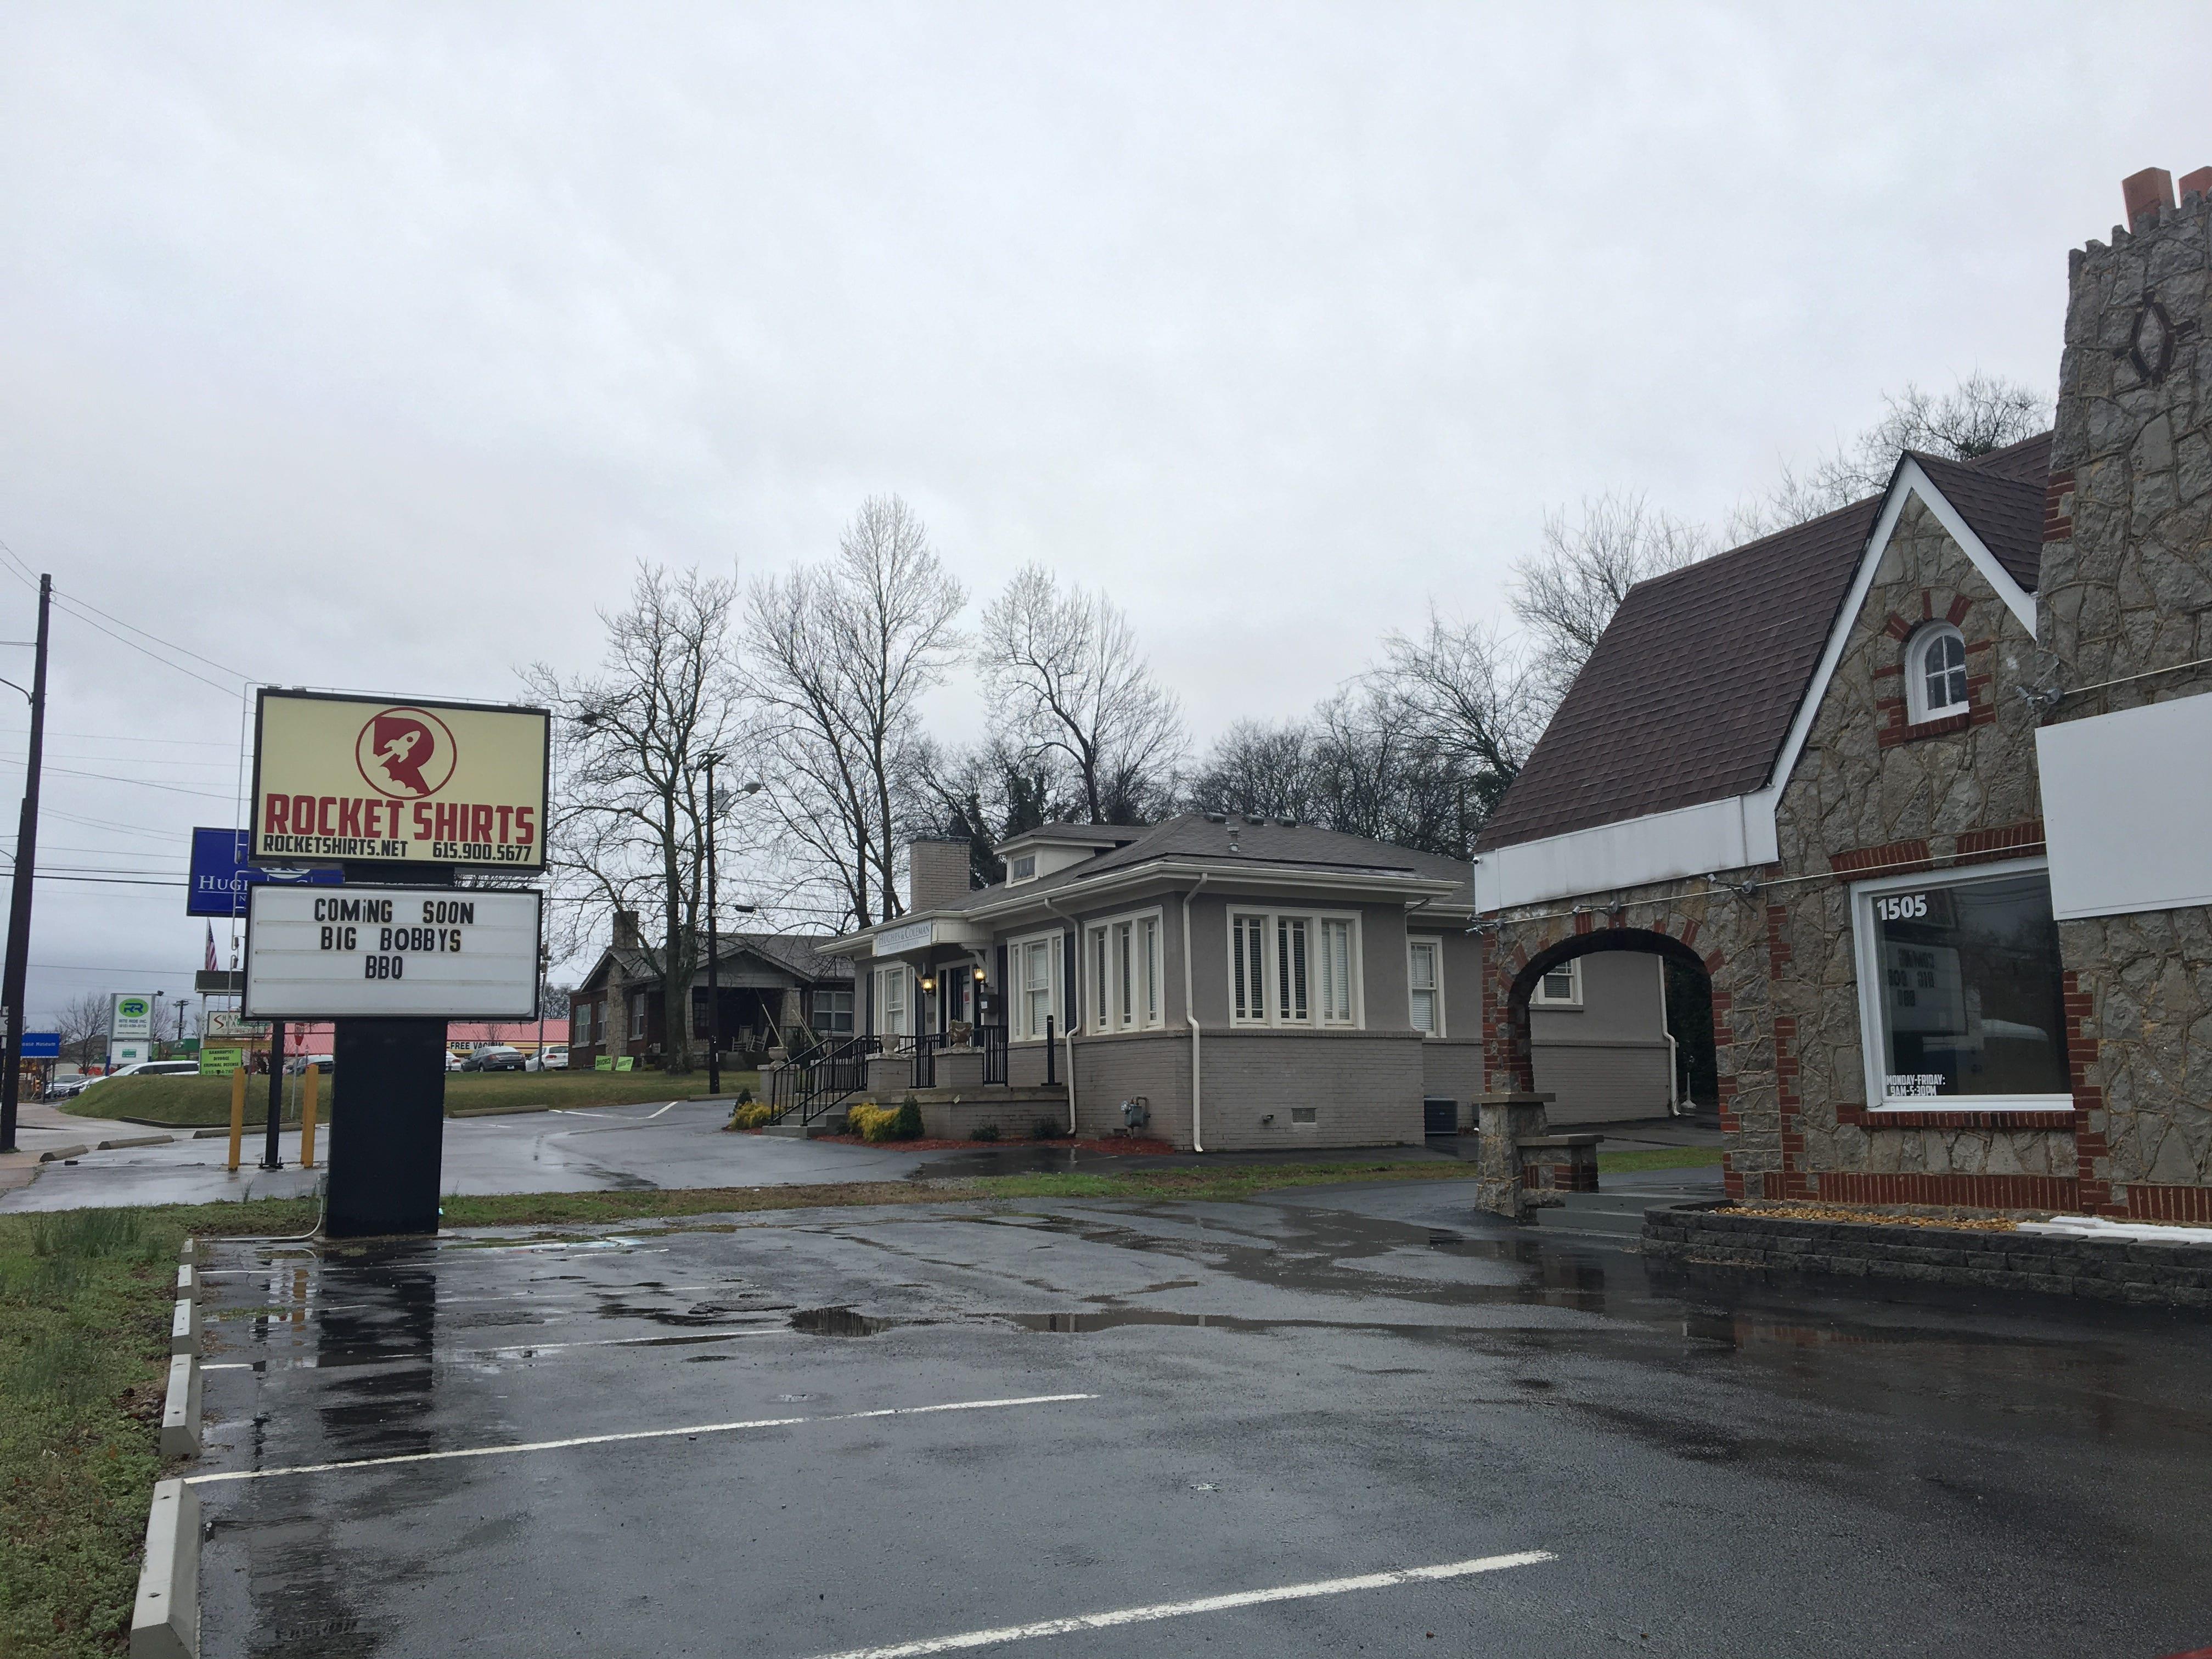 Big Bobby's BBQ will open in the spring at 1505 Memorial Blvd. in Murfreesboro.